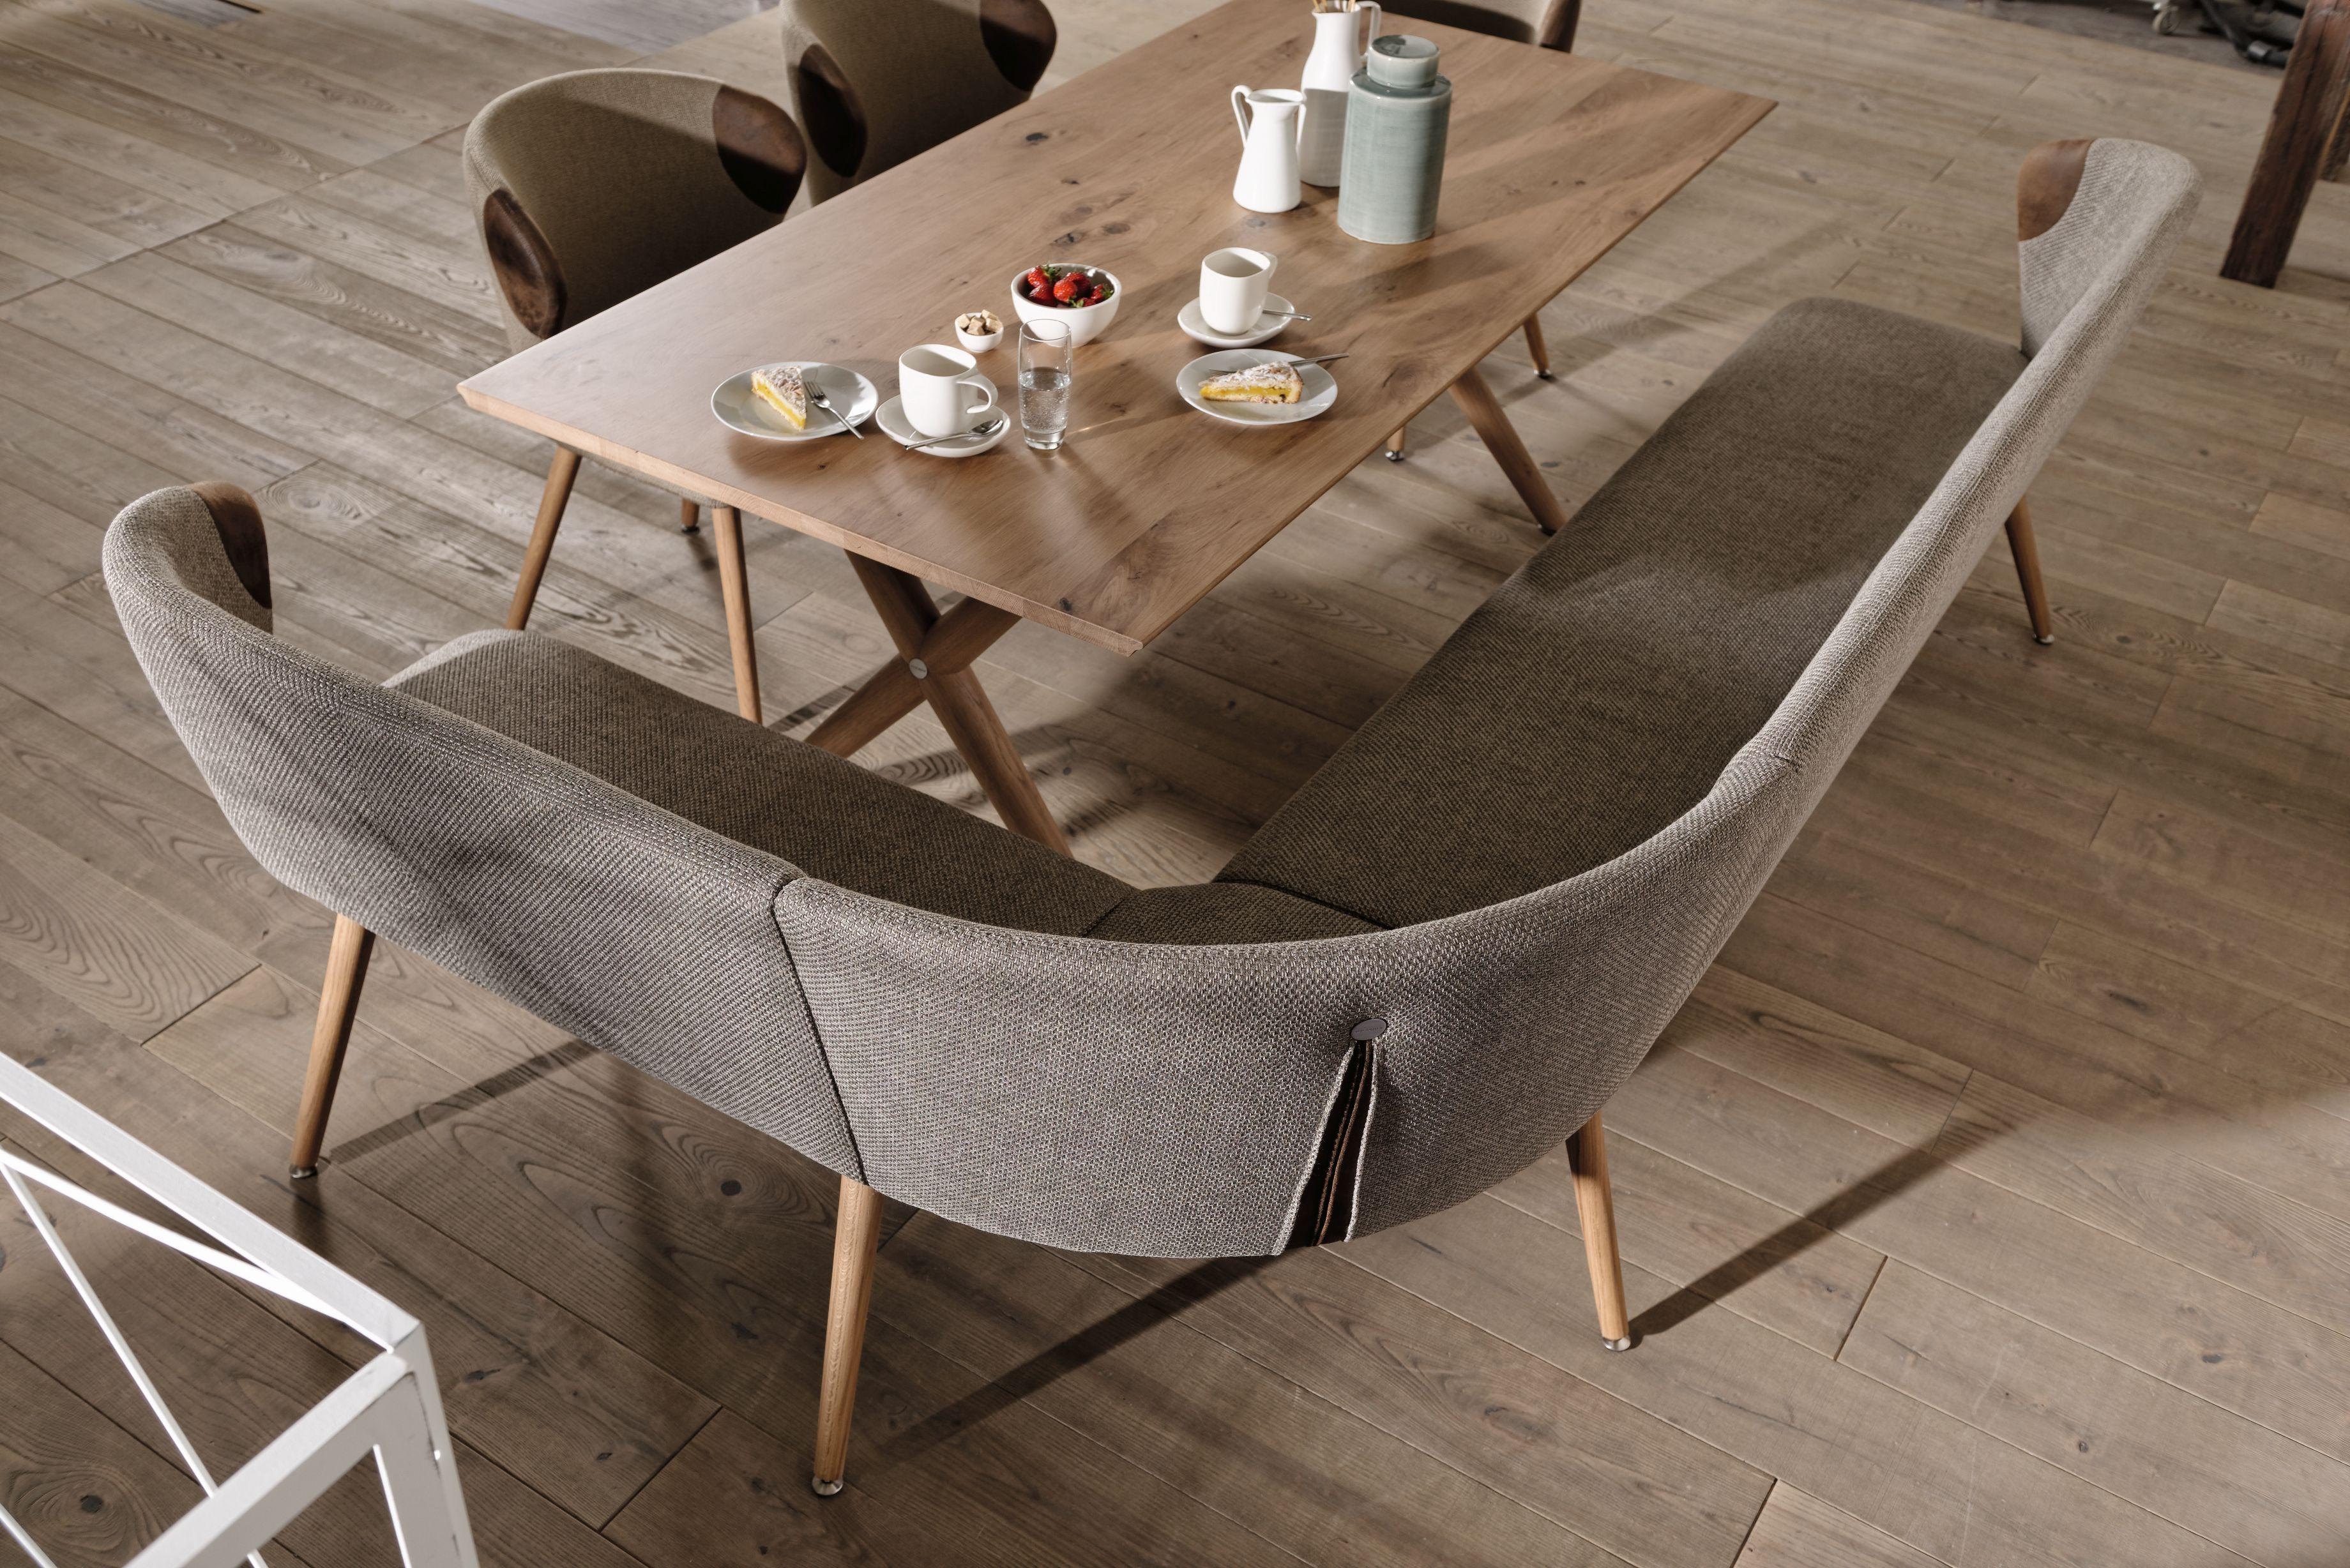 Voglauer V Alpin Tisch Stuhl Stuhl Design Stuhle Haus Interieurs